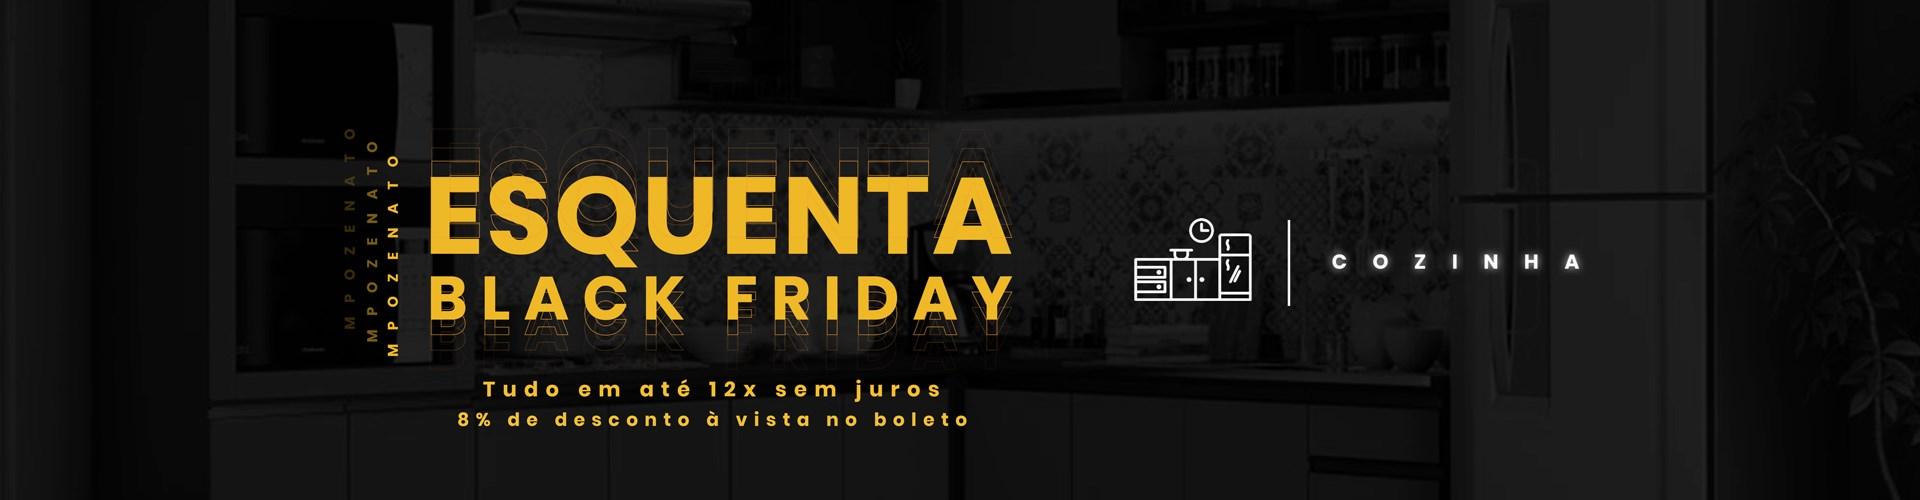 Esquenta Black Friday - Cozinha - Mpozenato